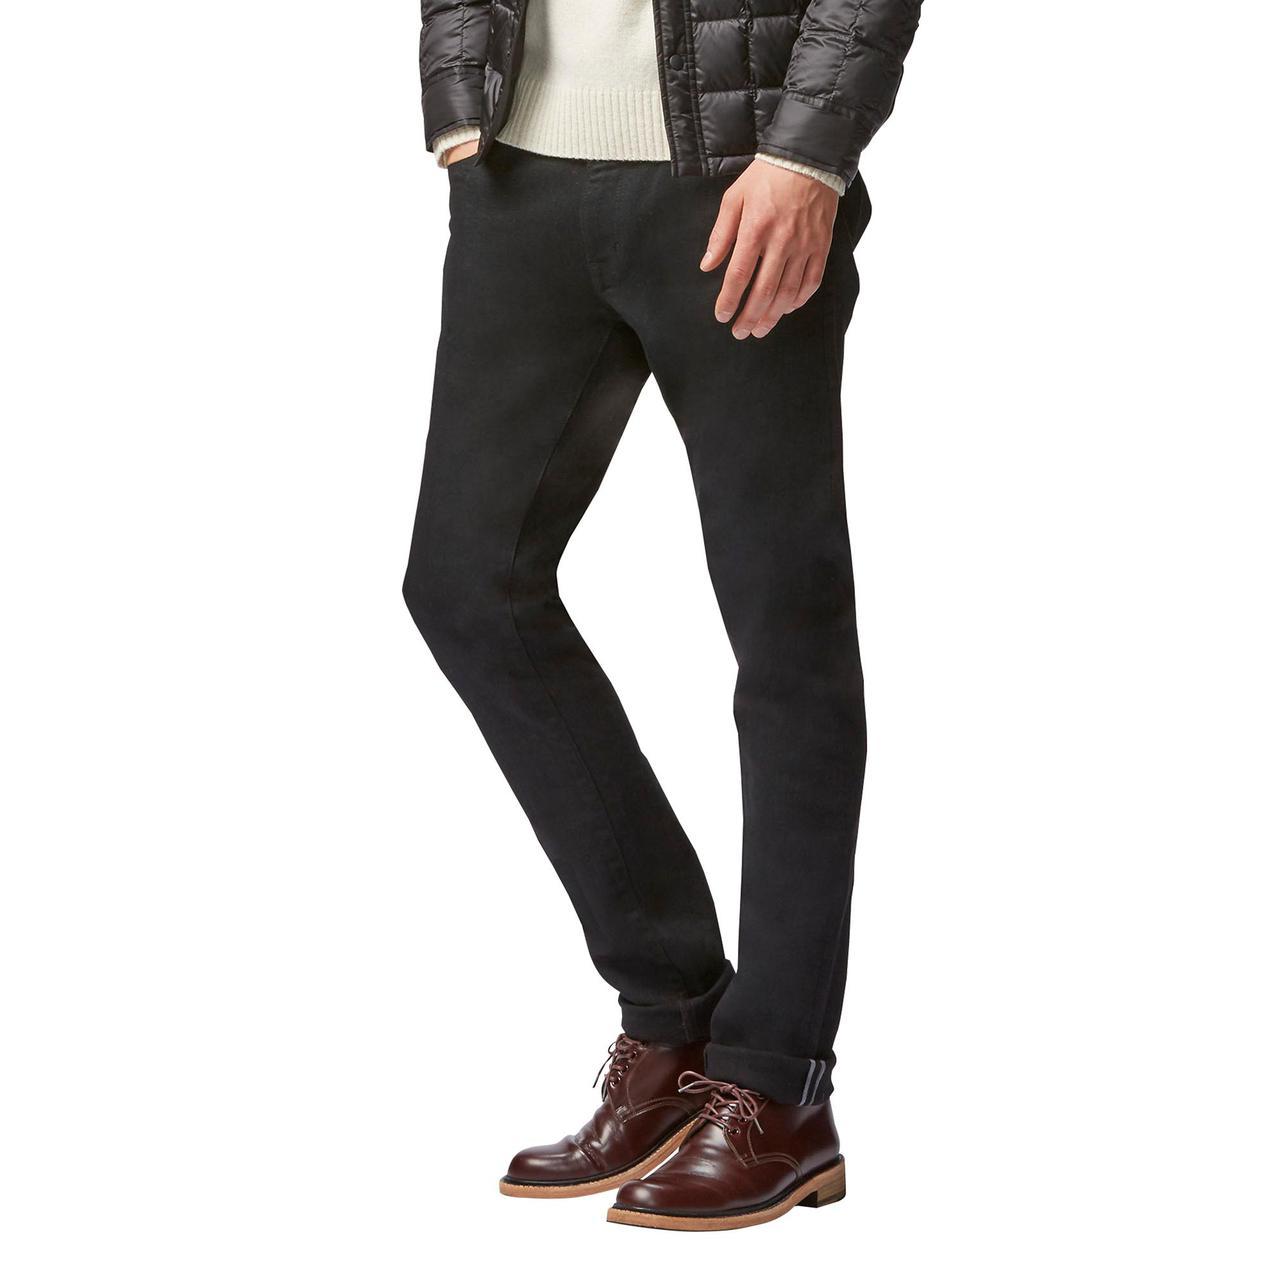 Джинсы Uniqlo Stretch Selvedge Skinny BLACK - Магазин распродаж  SuperStock.com.ua в Днепре a4127218dffa5